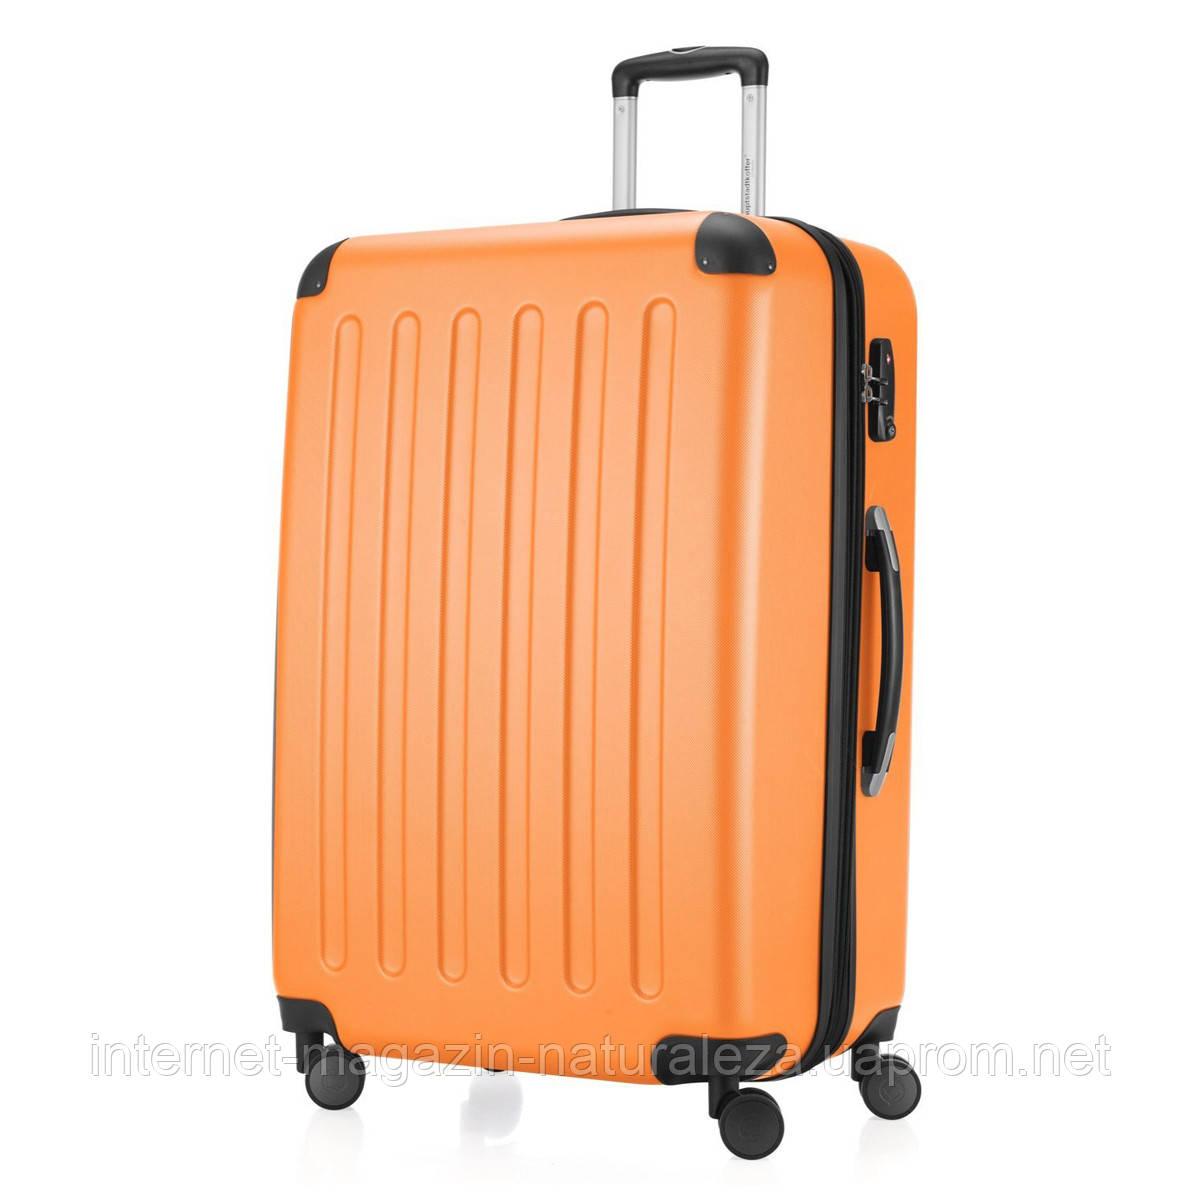 Большие чемоданы Hauptstadtkoffer maxi Spree оранжевый